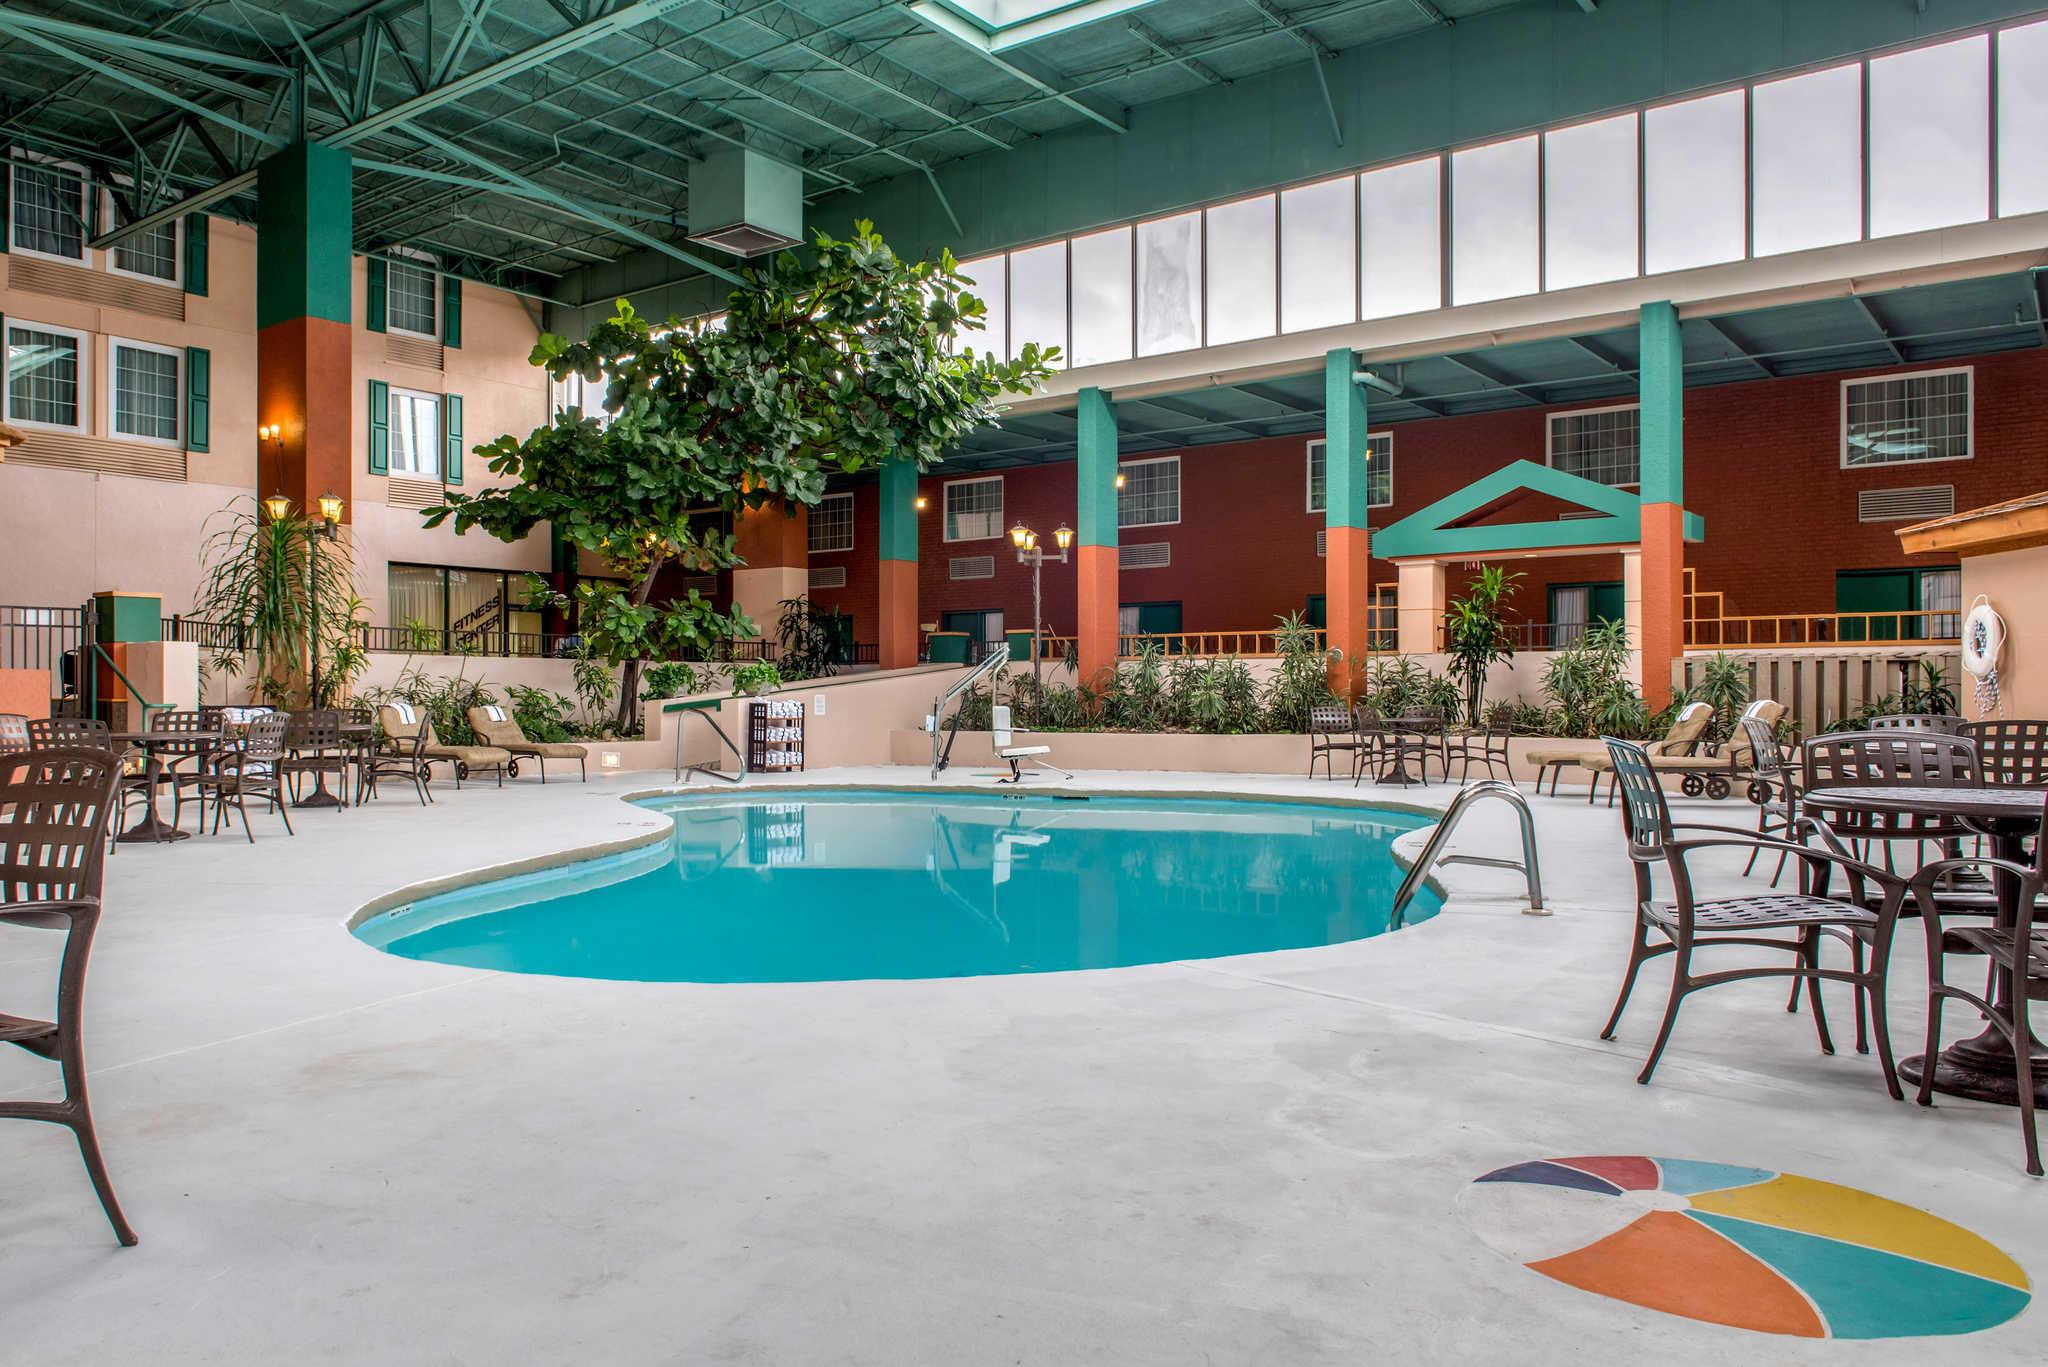 Quality Hotel - Cincinnati Blue Ash image 32